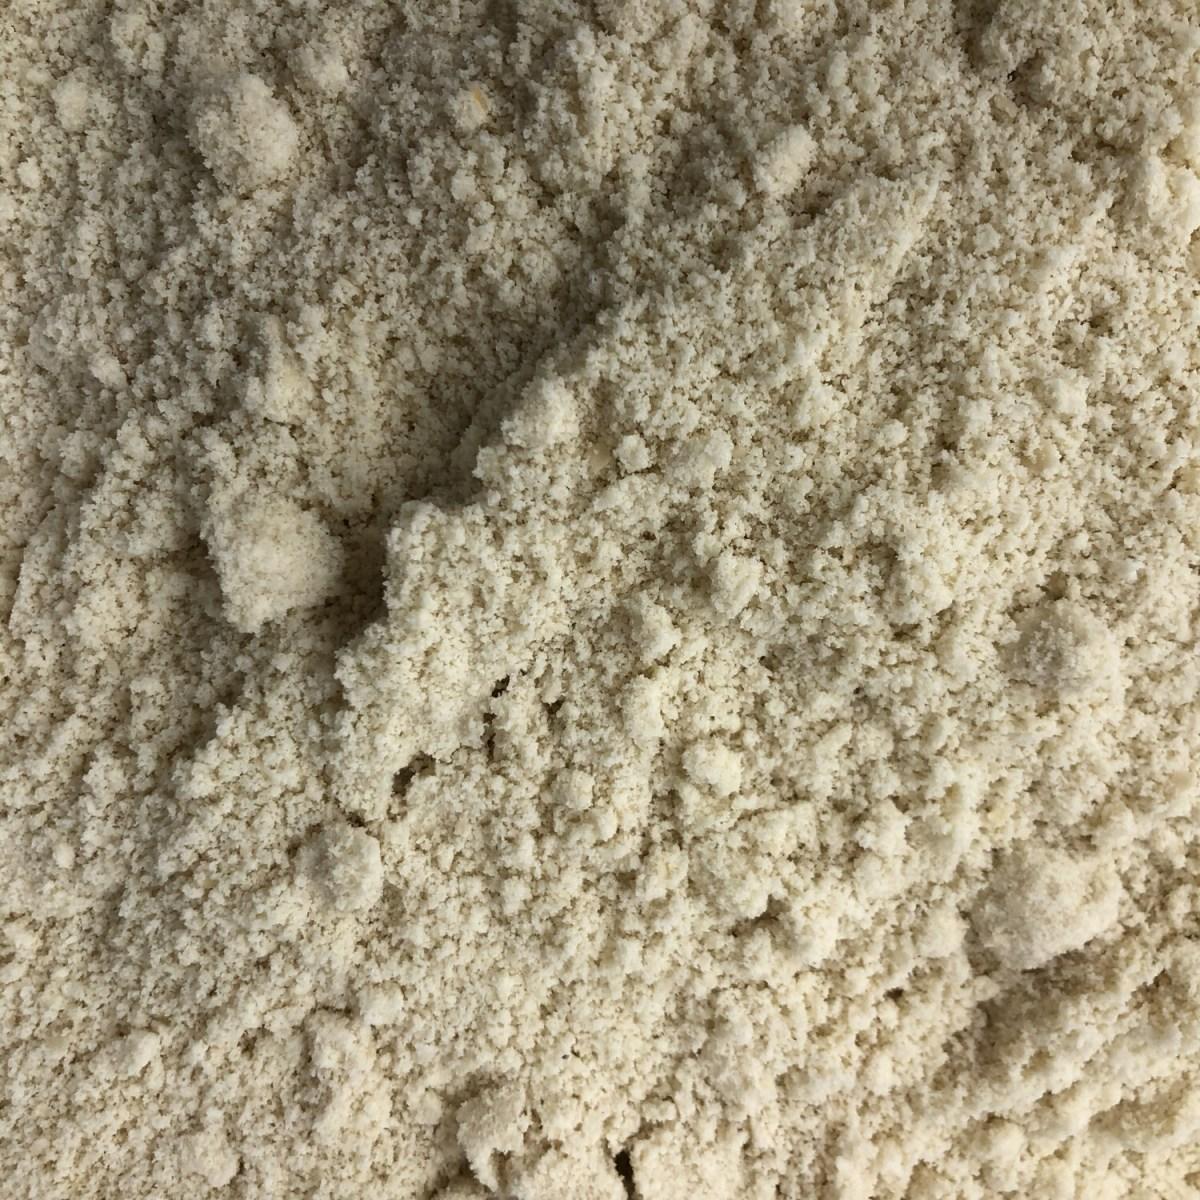 Farine d'amande Blanche Bio: 1 kg (20,49% de protéines)